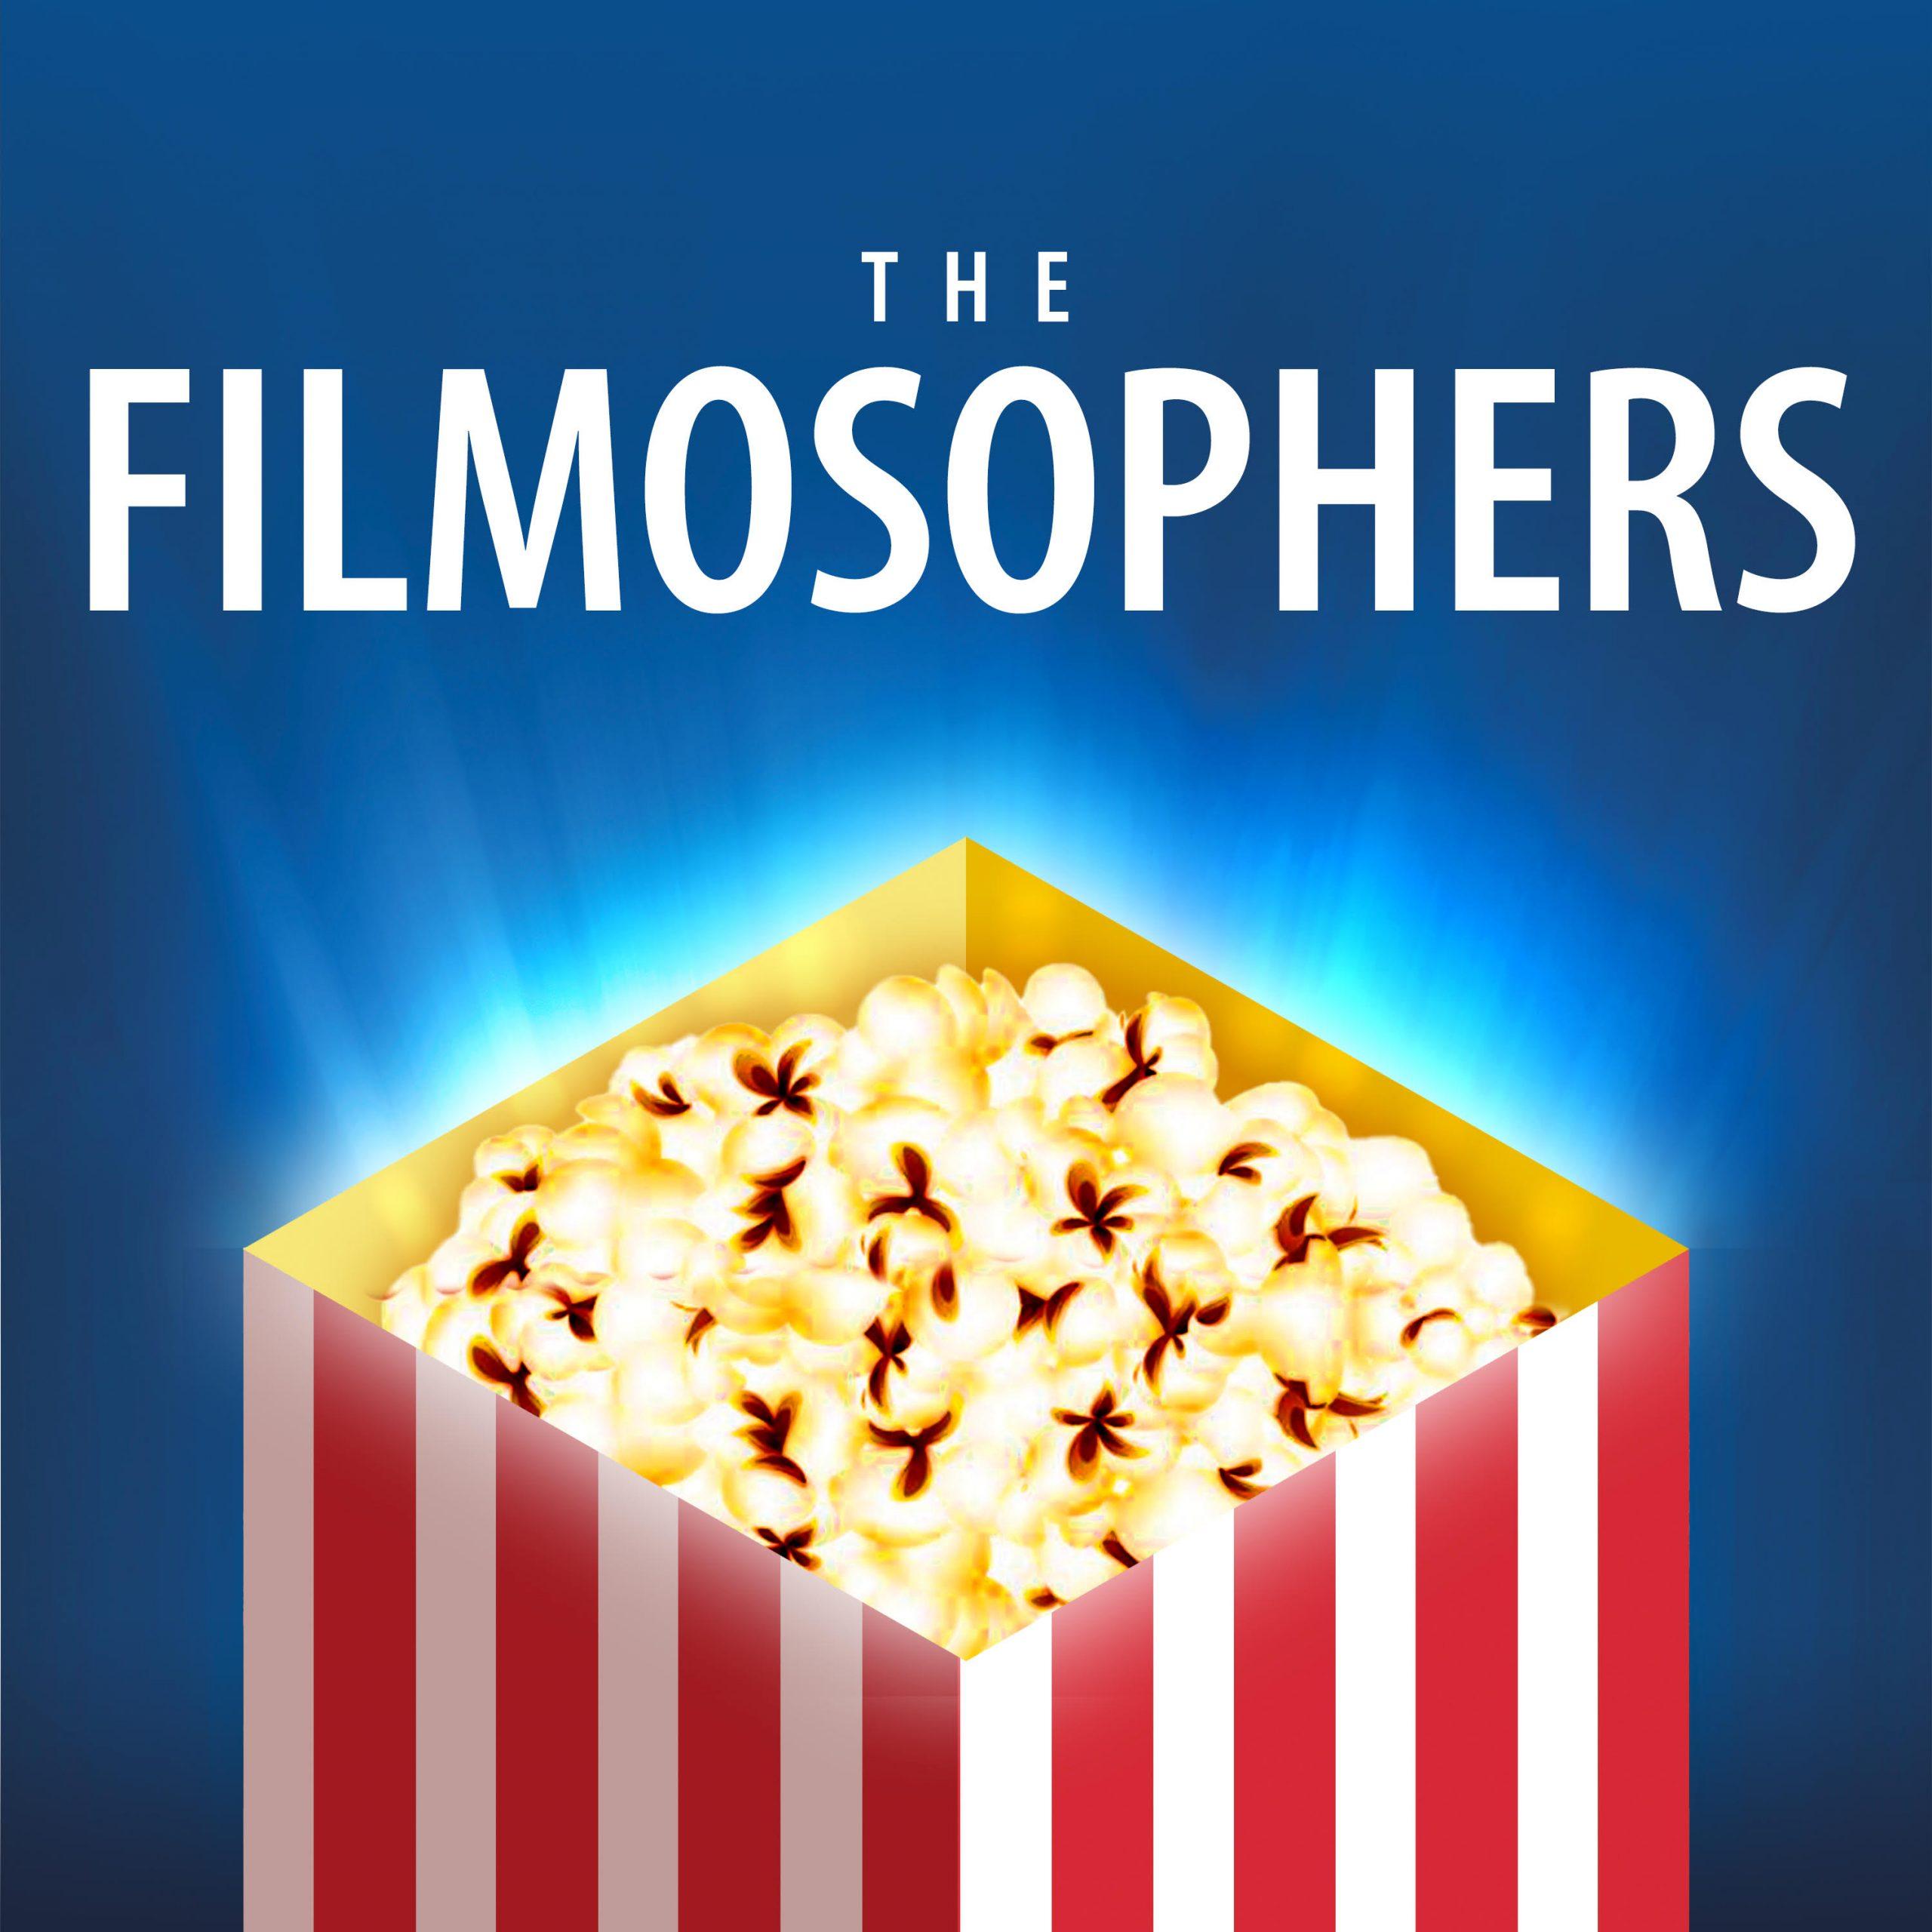 filmosophers logo 2